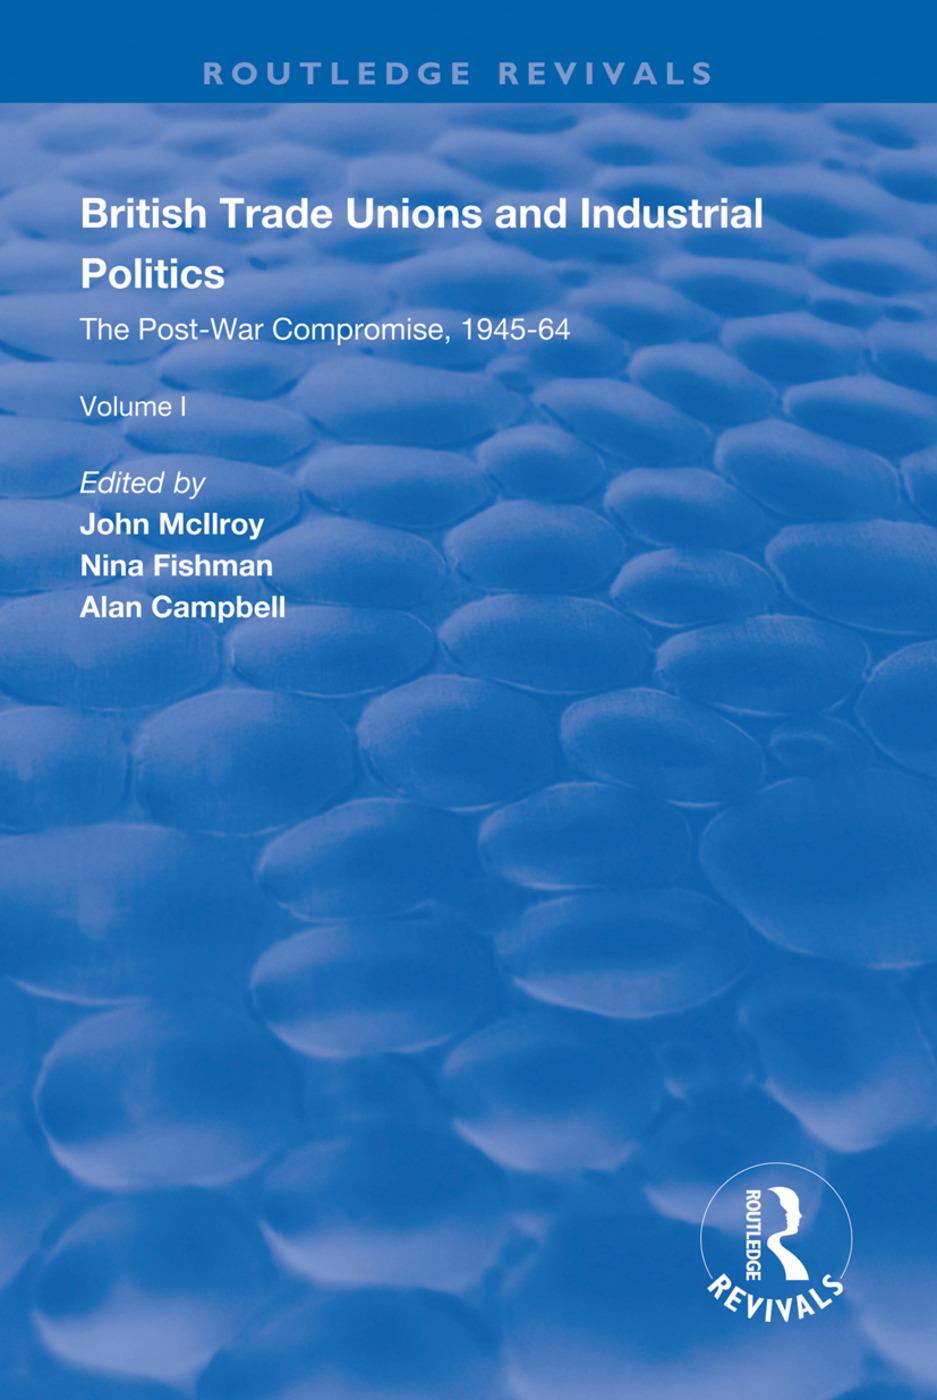 British Trade Unions and Industrial Politics